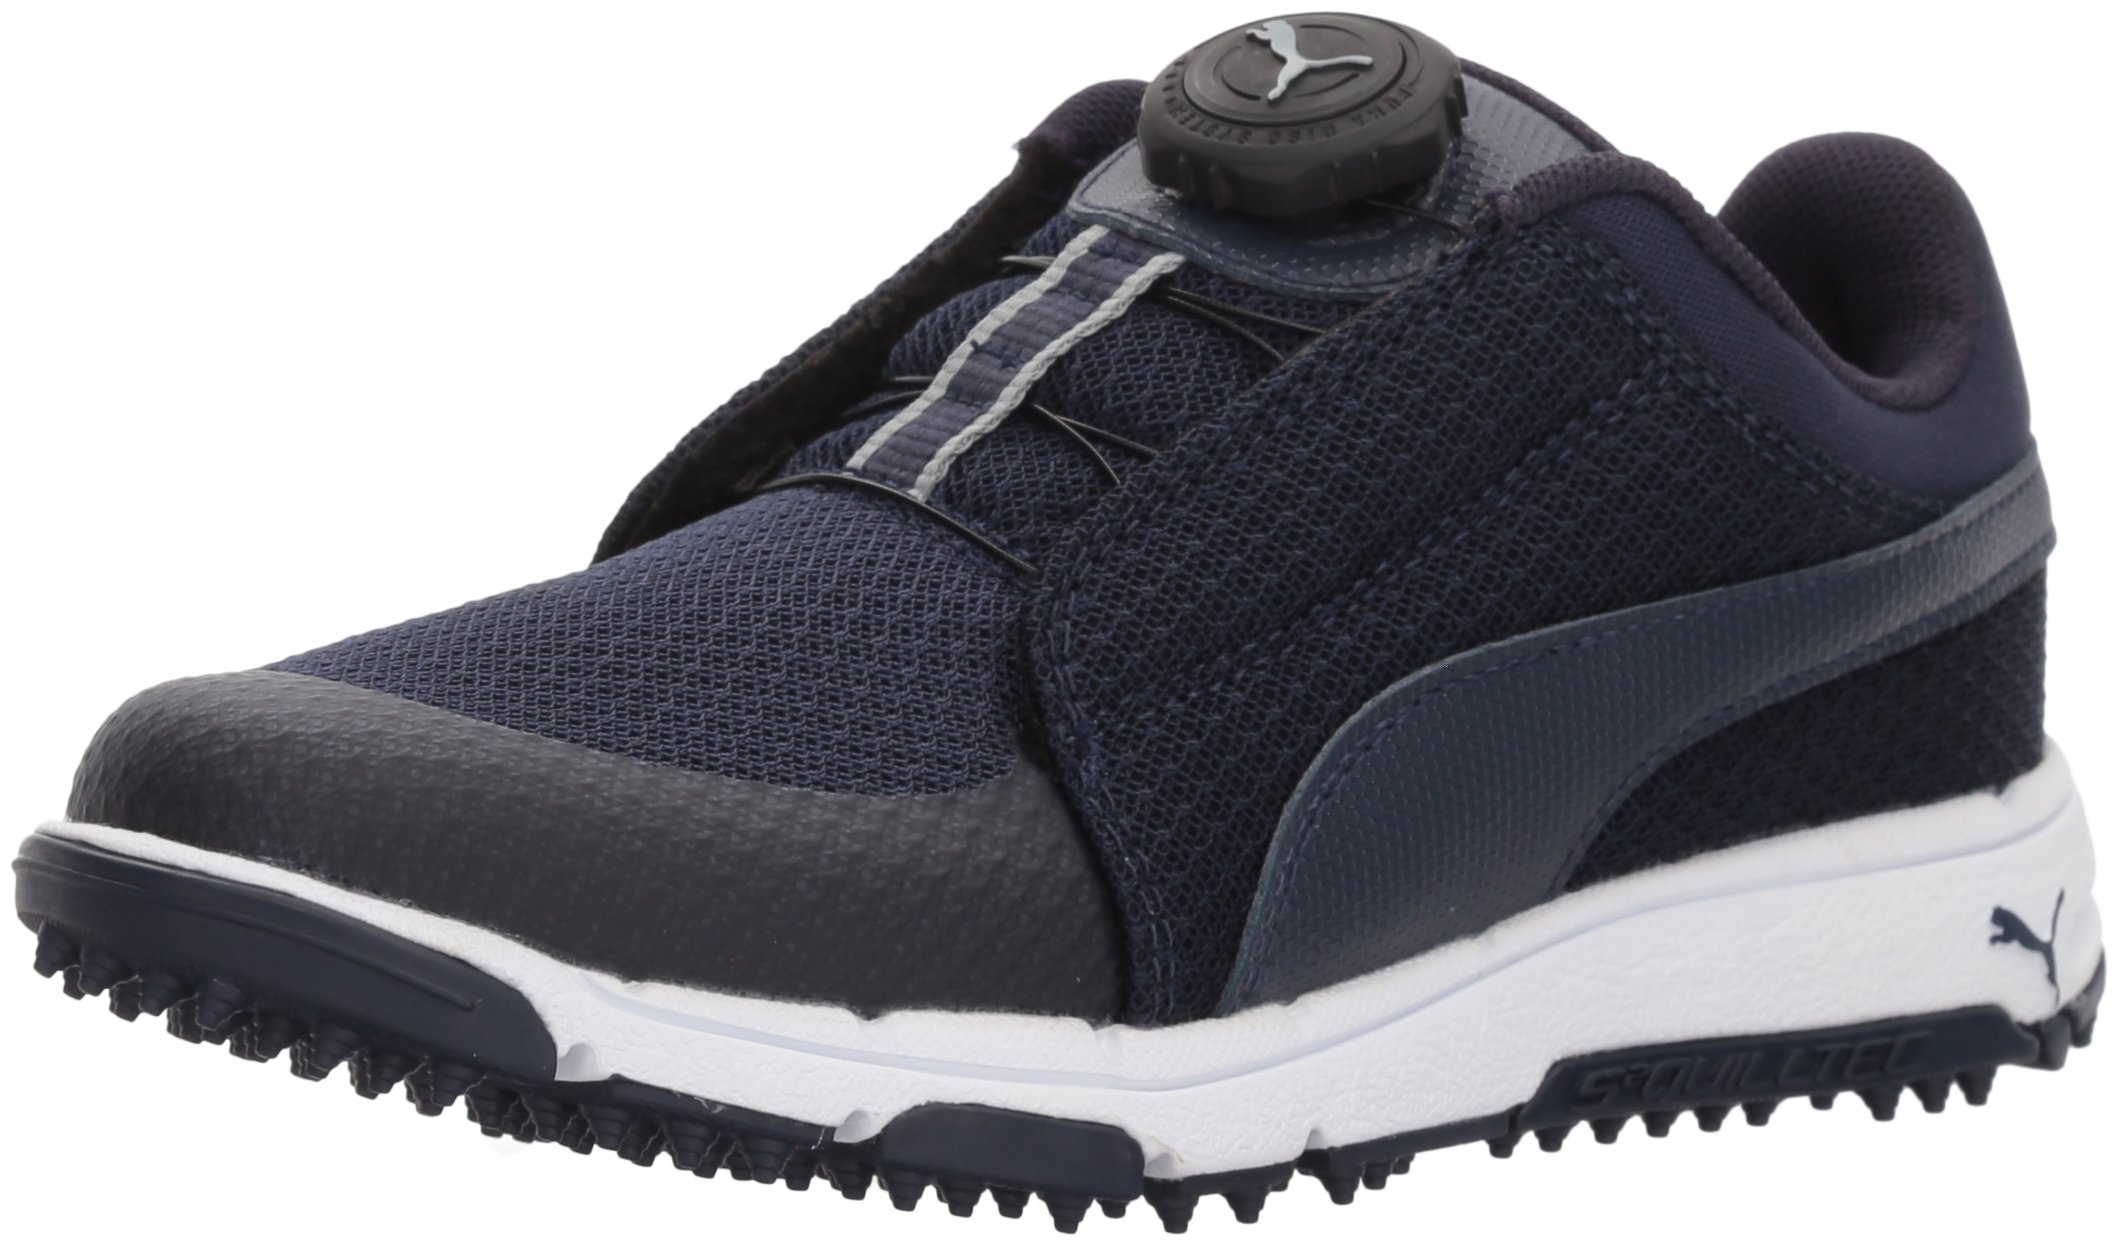 PUMA Golf Boys' Grip Sport Disc Golf Shoe, Peacoat/Peacoat/Quarry, 5 Youth US Big Kid